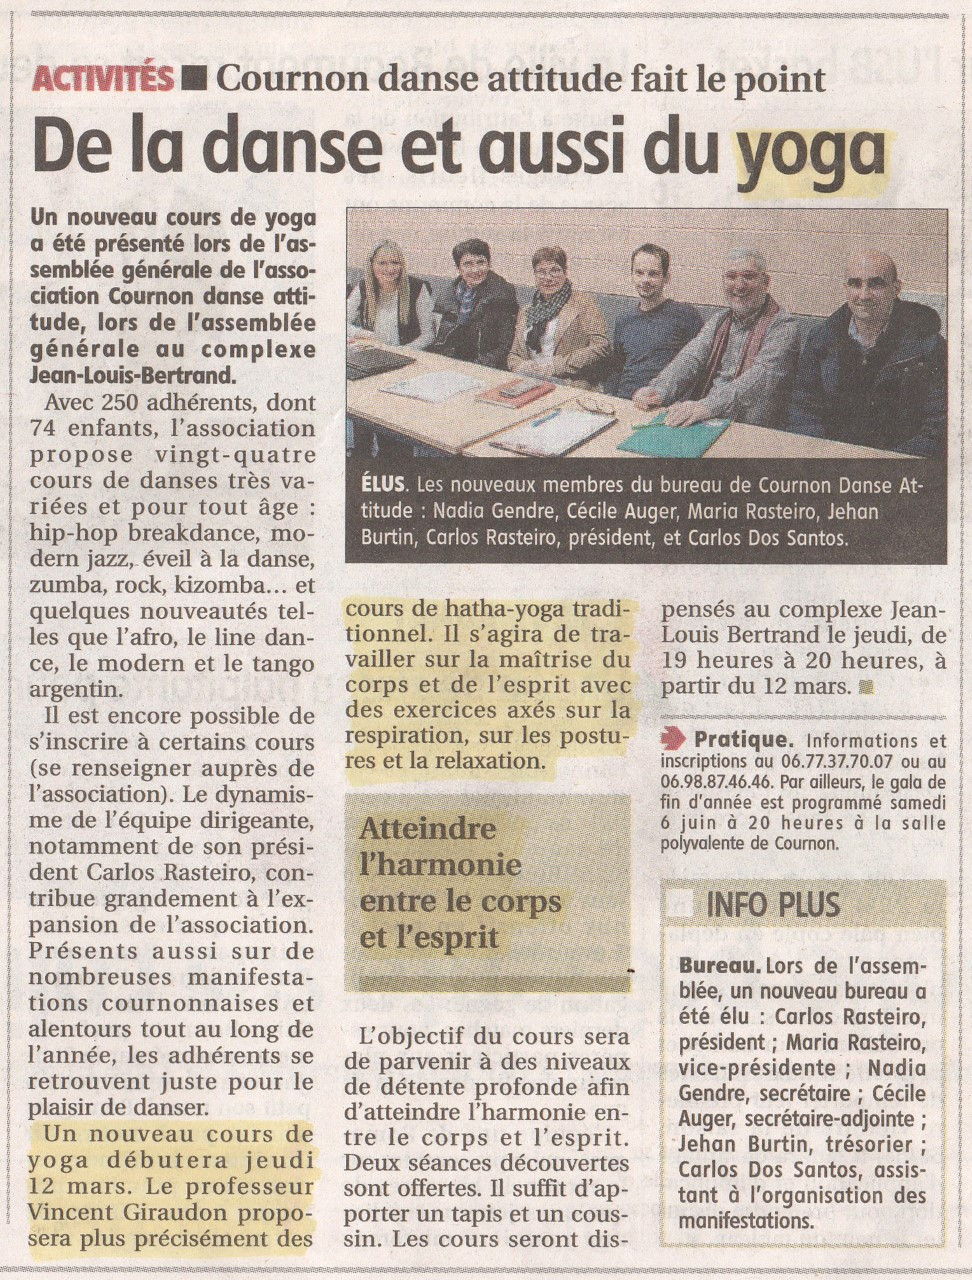 Yoga avec Cournon Danse Attitude - Février 2020